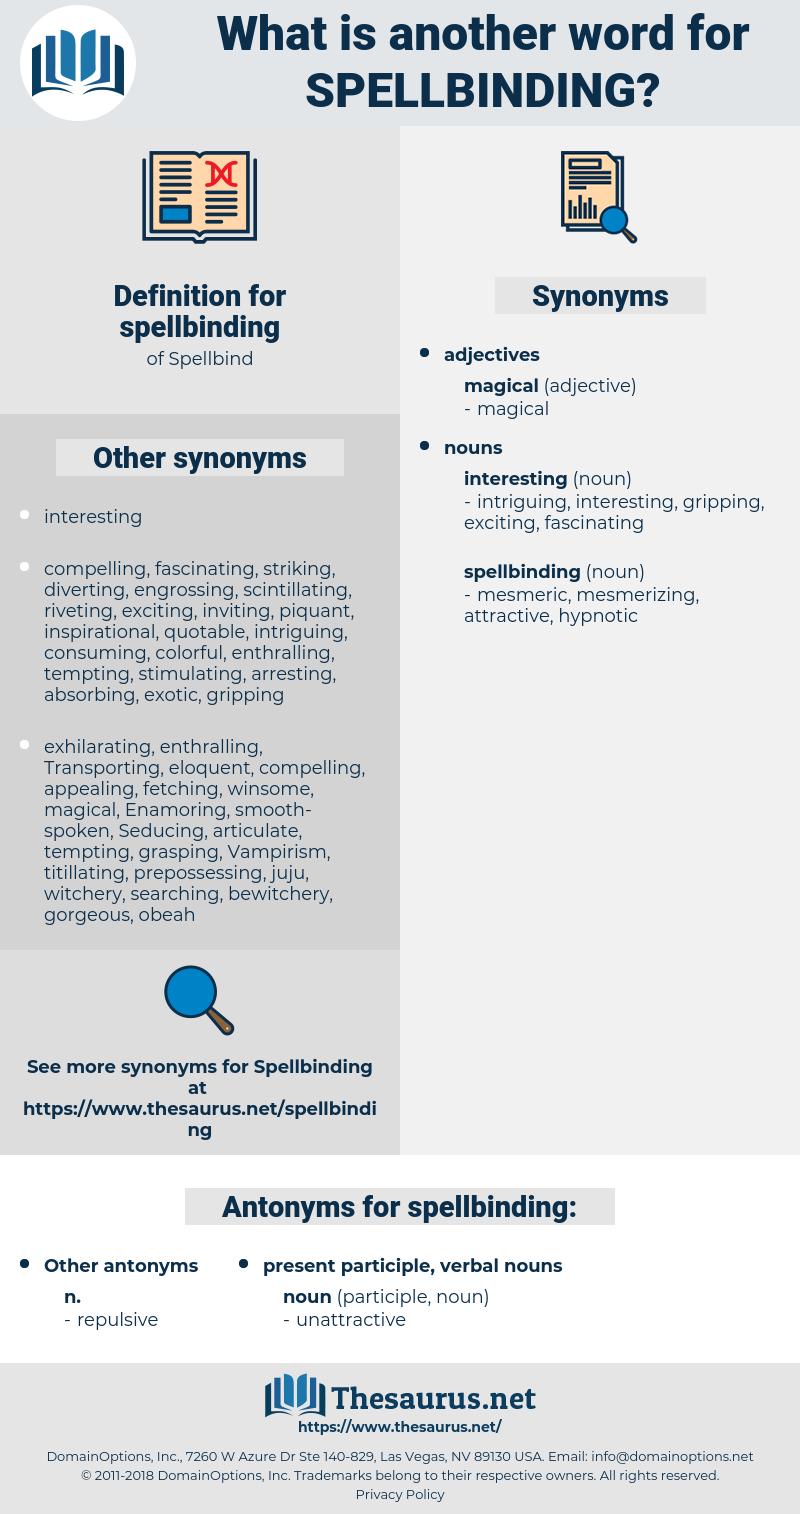 spellbinding, synonym spellbinding, another word for spellbinding, words like spellbinding, thesaurus spellbinding